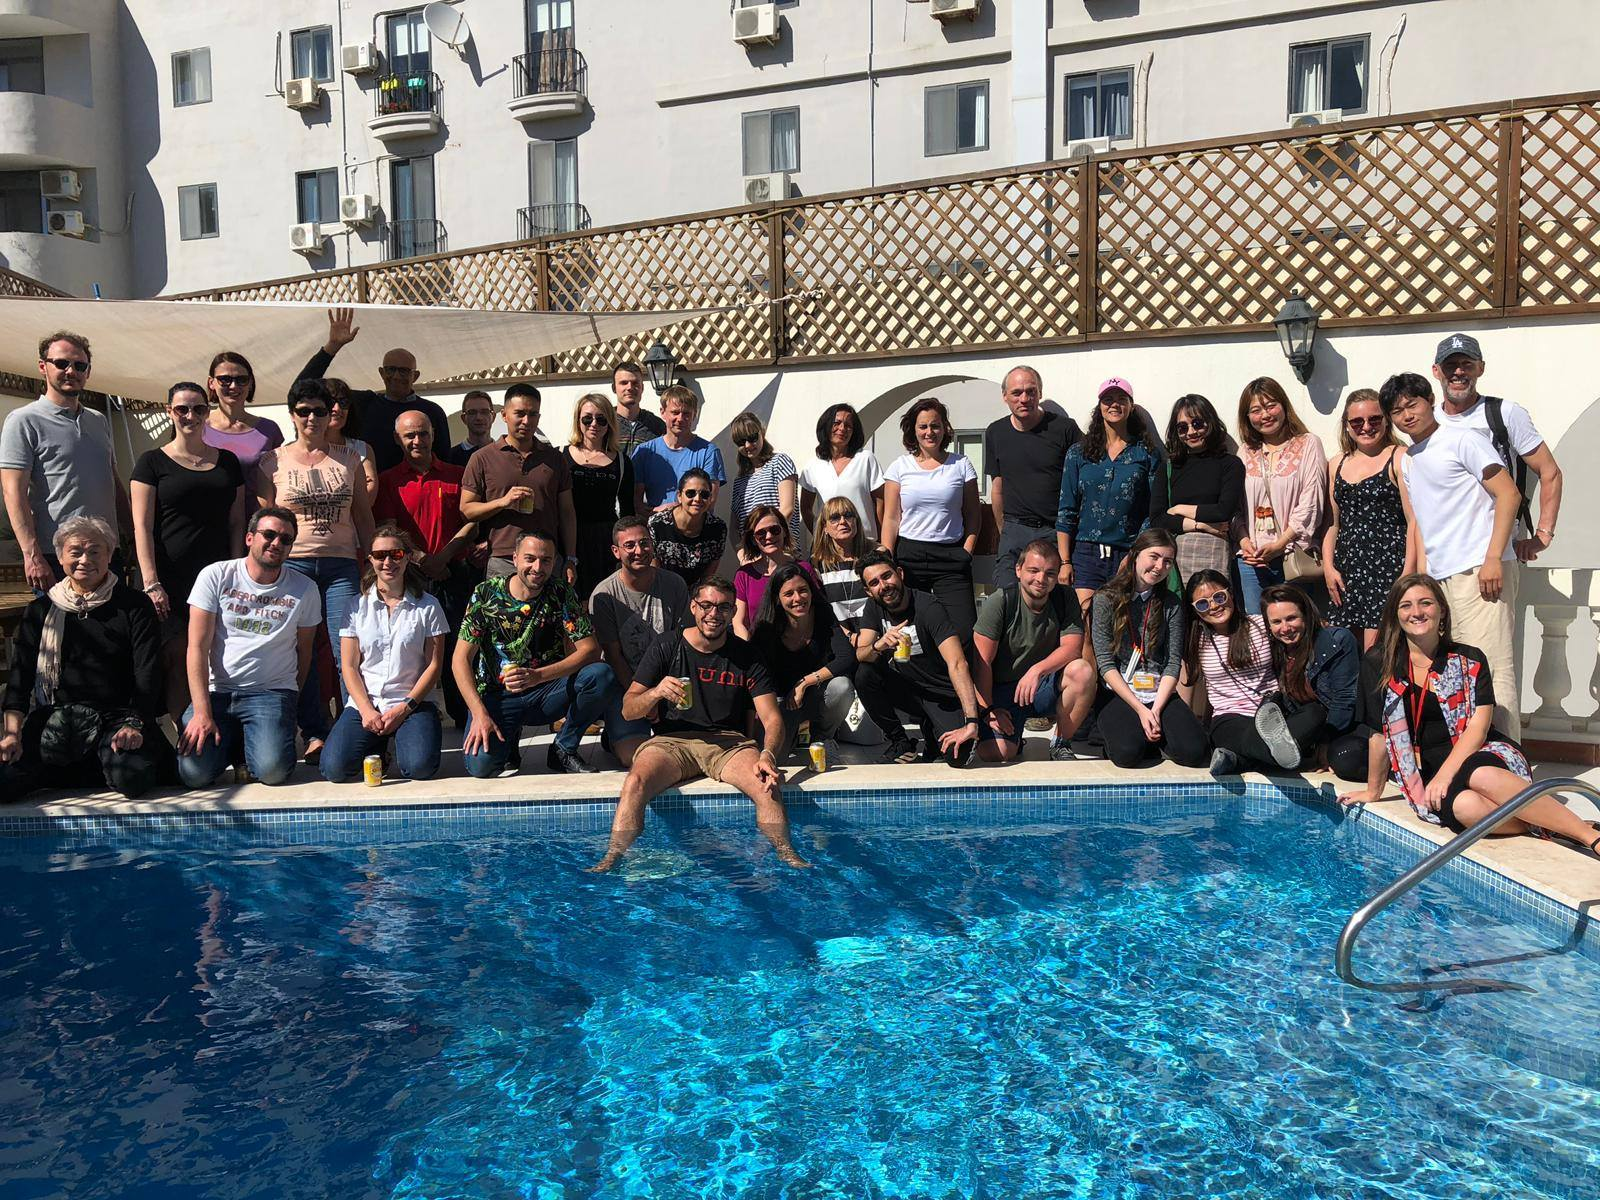 maltalingua swimming pool piscine